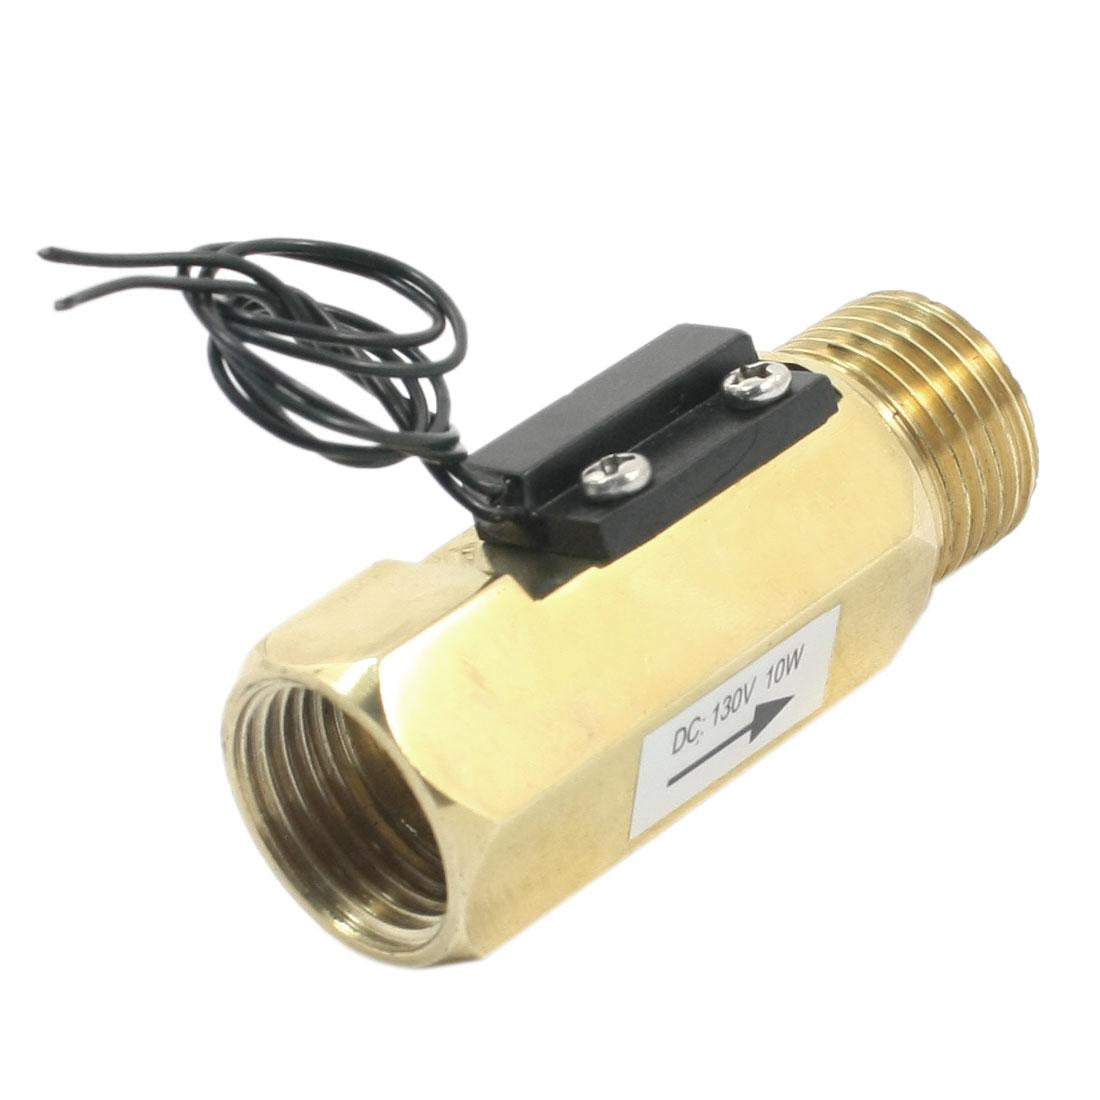 SEN-ZL21F G1/2 M/F Threaded 10W 10mA Gravity Brass Water Flow Switch Flowmeter